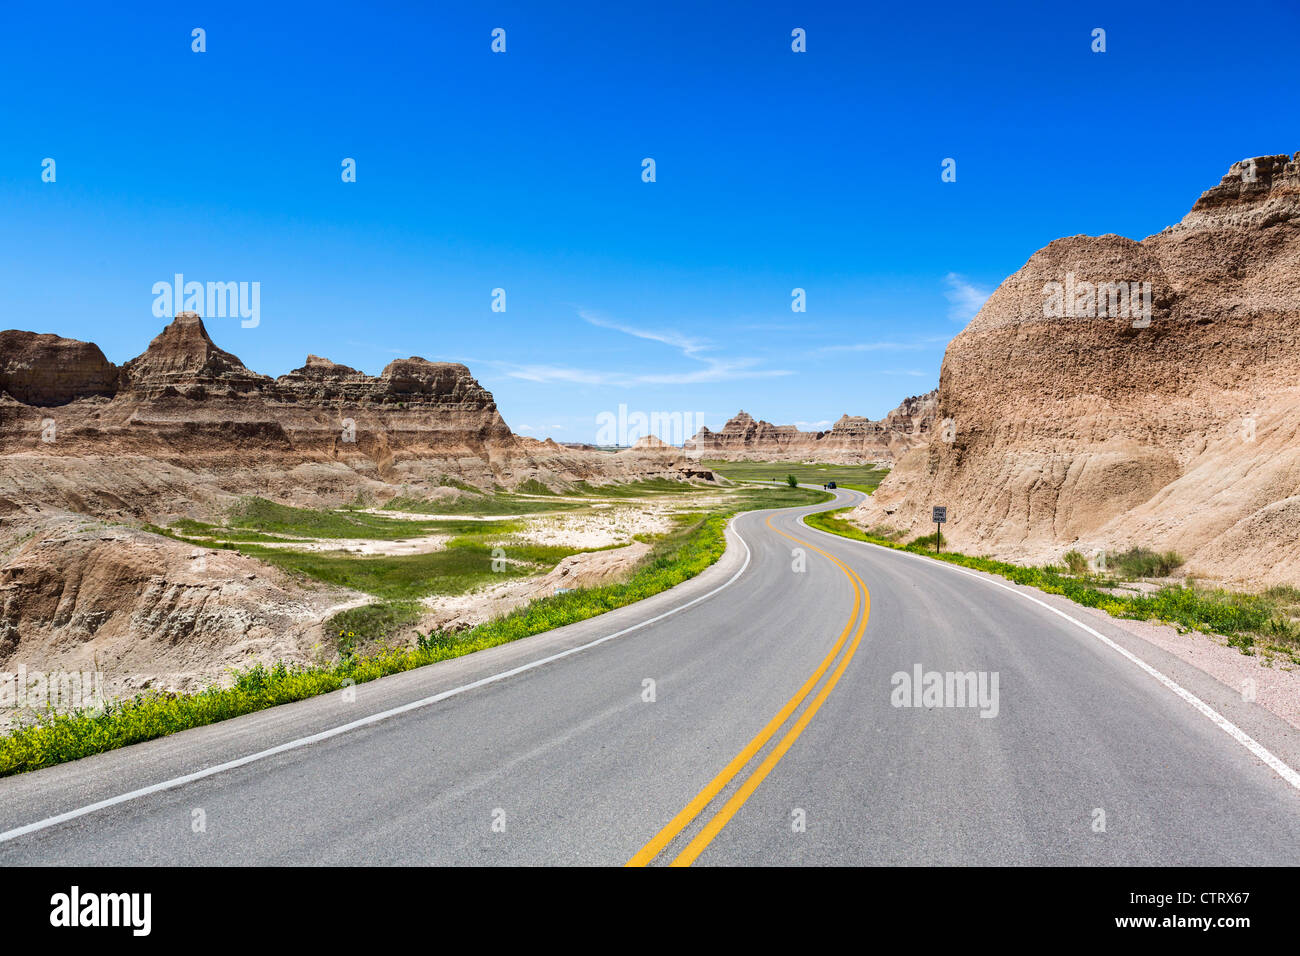 Distant car on the Loop road through Badlands National Park, South Dakota, USA - Stock Image